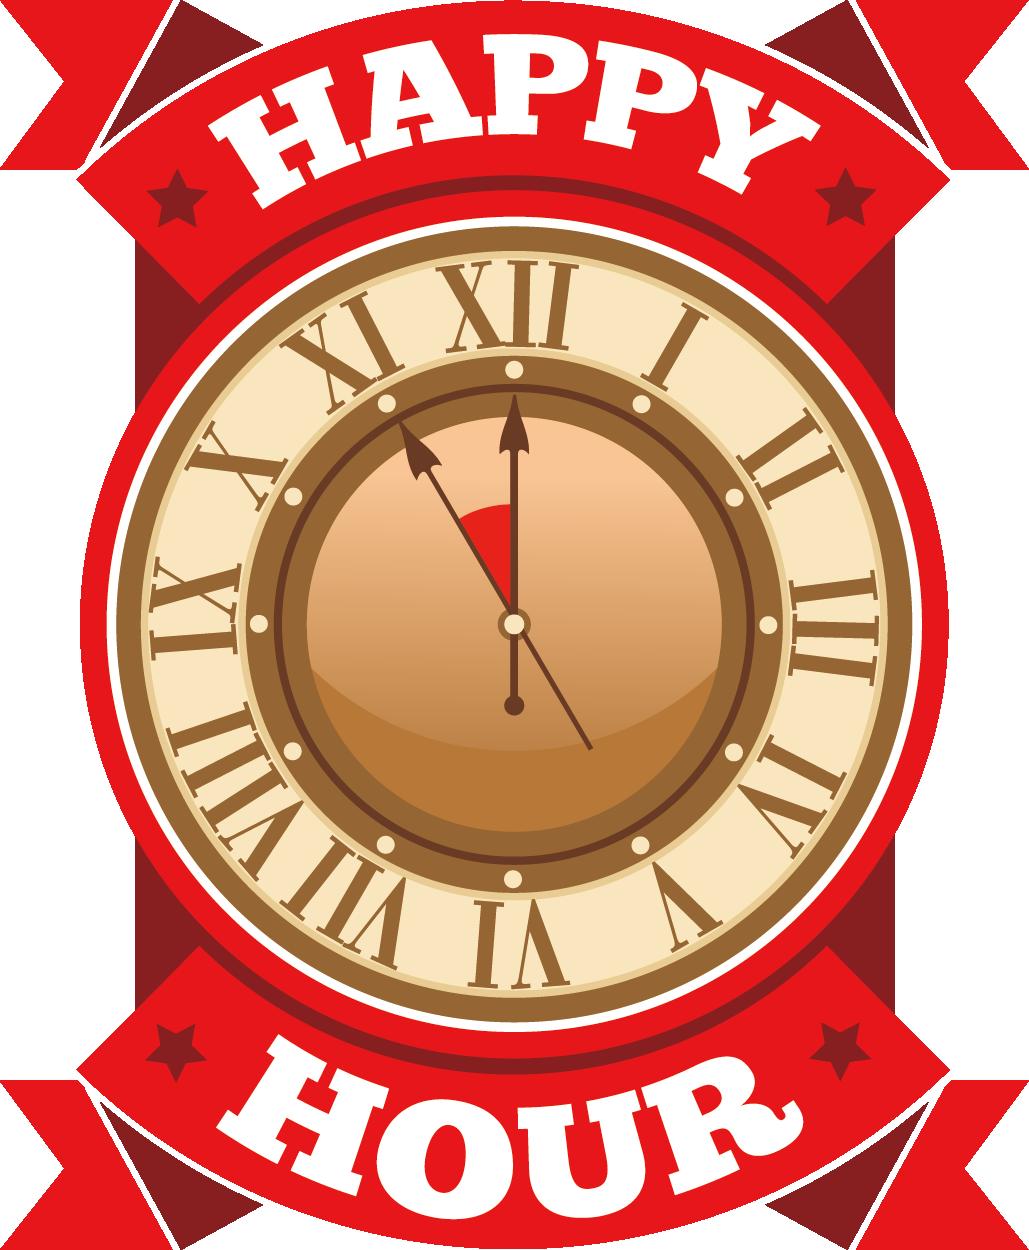 Happy Hour Stock Illustration Label Illustration - Big Brother Eye 2011 (1029x1250)